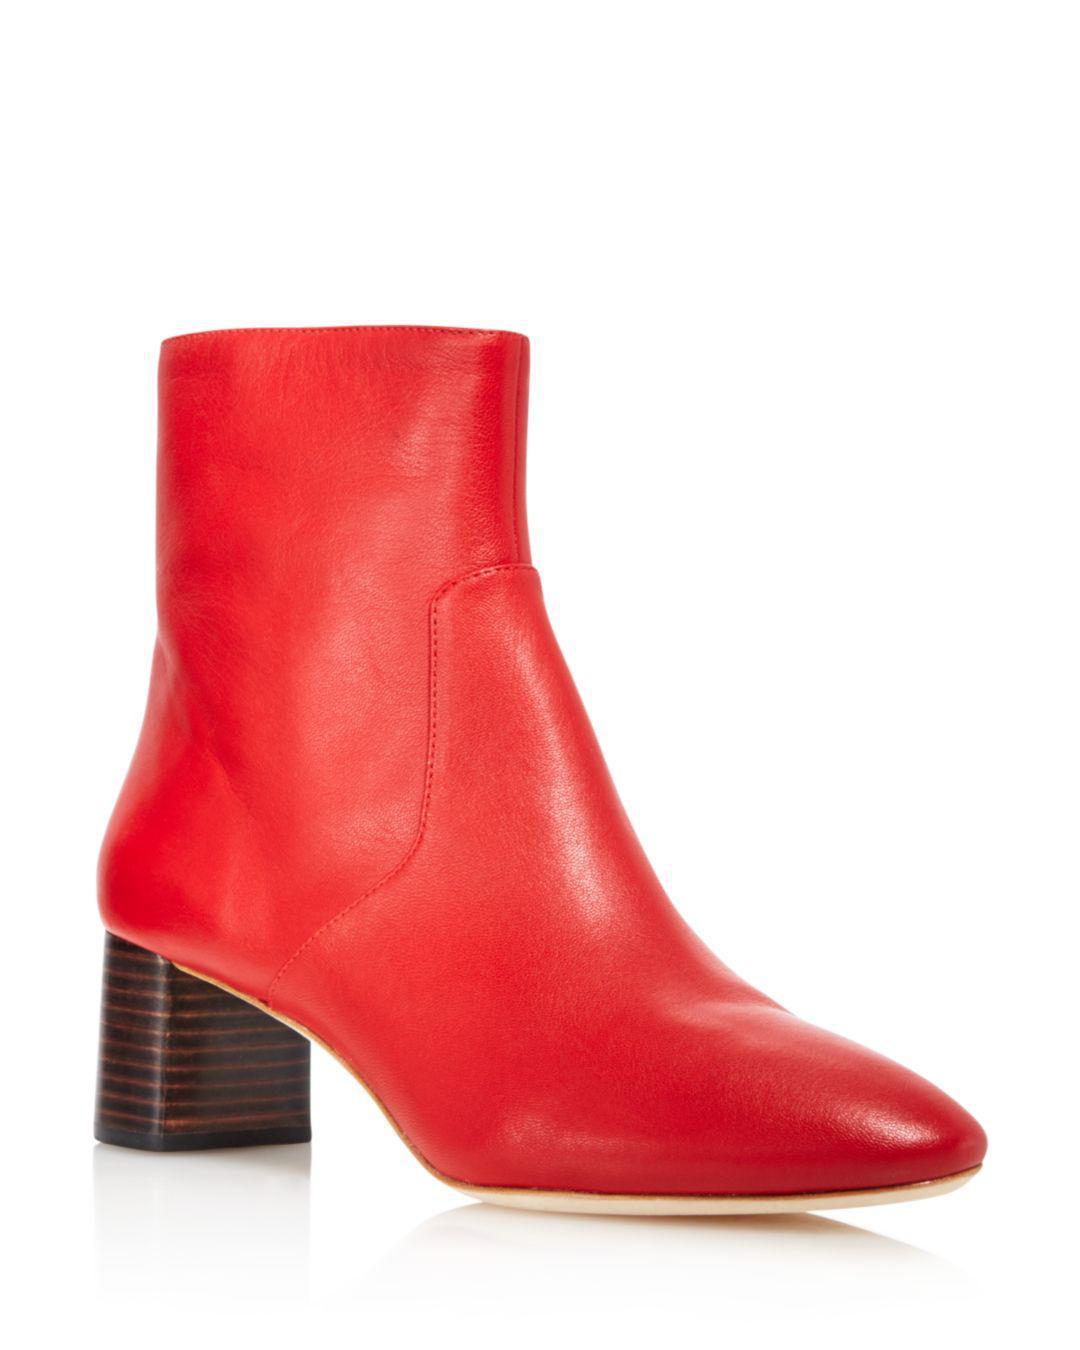 9189adbf18b4 Lyst - Loeffler Randall Women s Gema Pointed Toe Leather Booties in Red